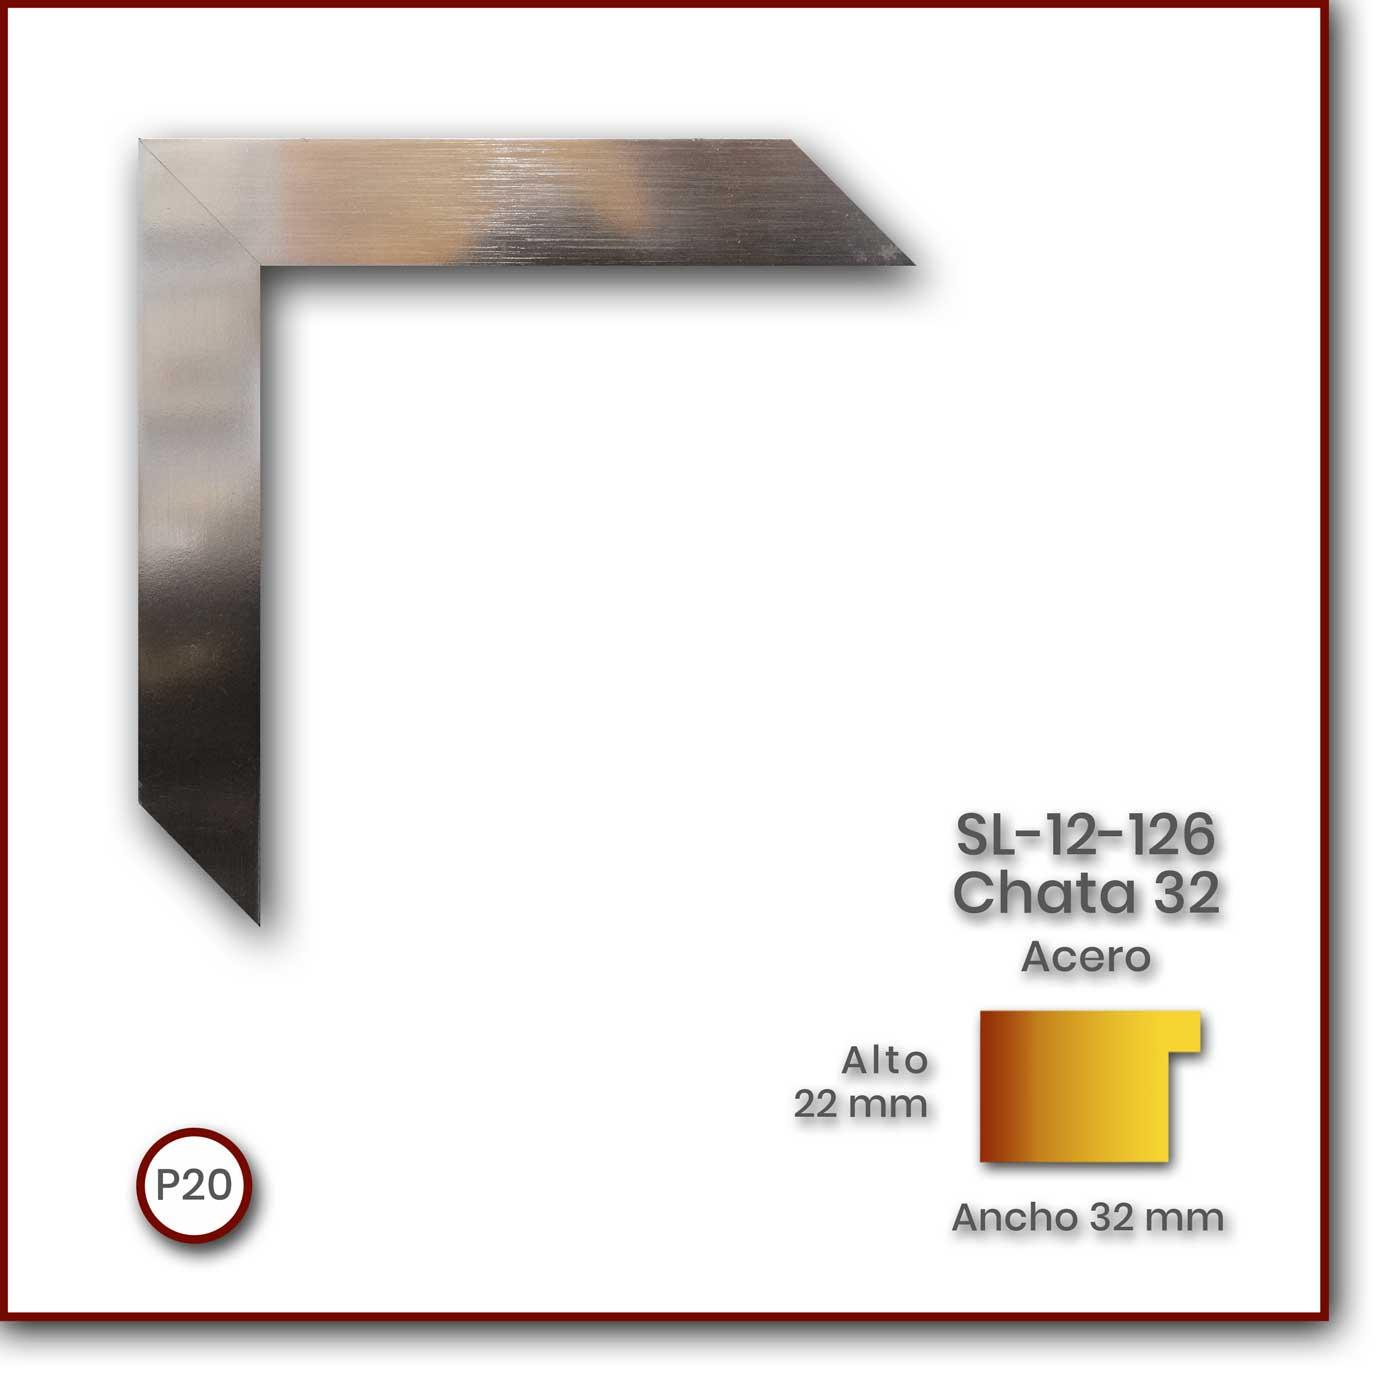 SL-12-126_Chata-32_Acero_32x22_P20